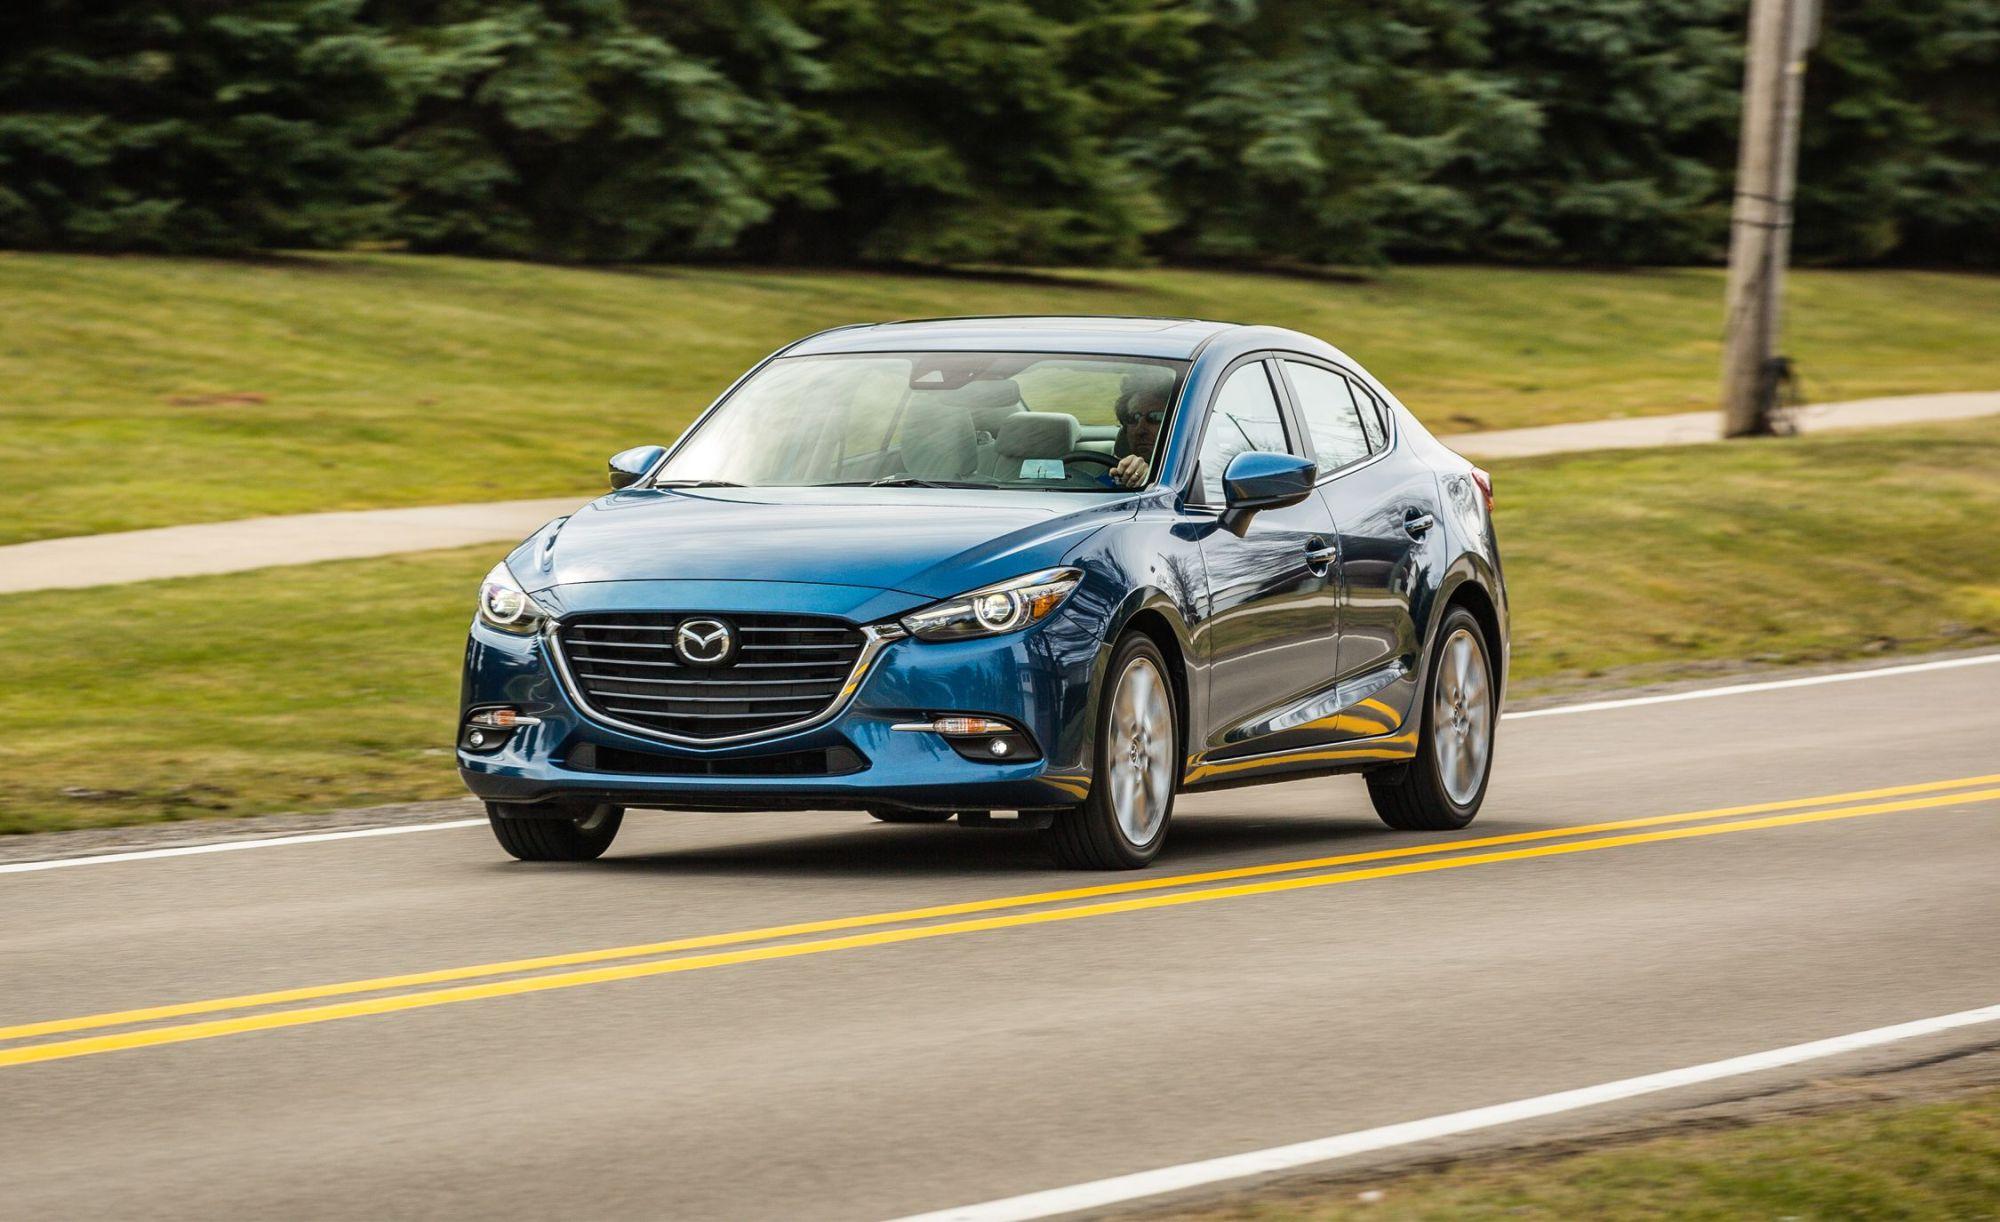 hight resolution of 2017 mazda 3 2 5l automatic sedan